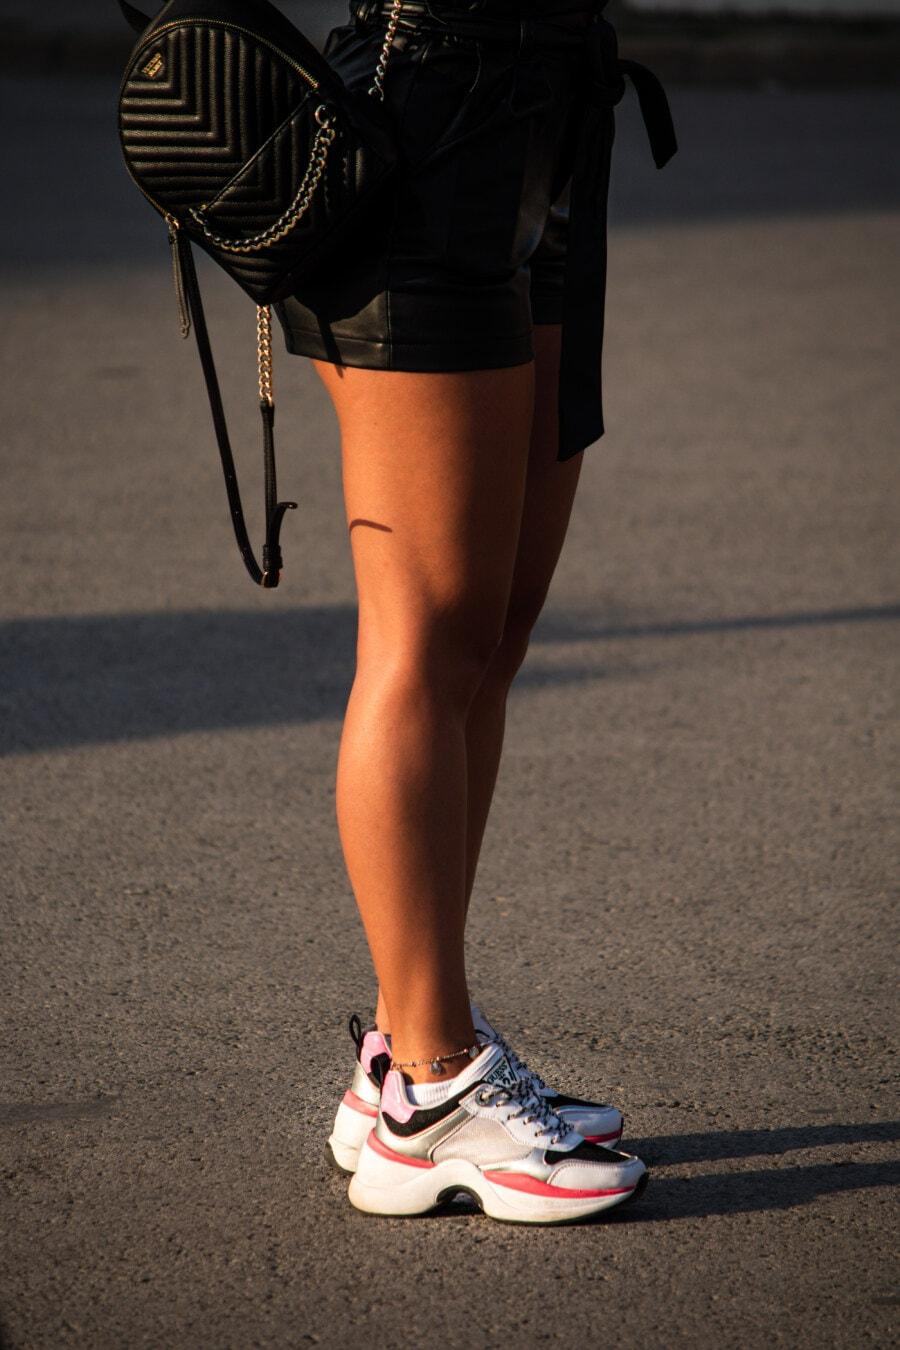 jupe, Outfit, jeune fille, fantaisie, sac à main, en cuir, noir, chaussures de sport, jambes, rue